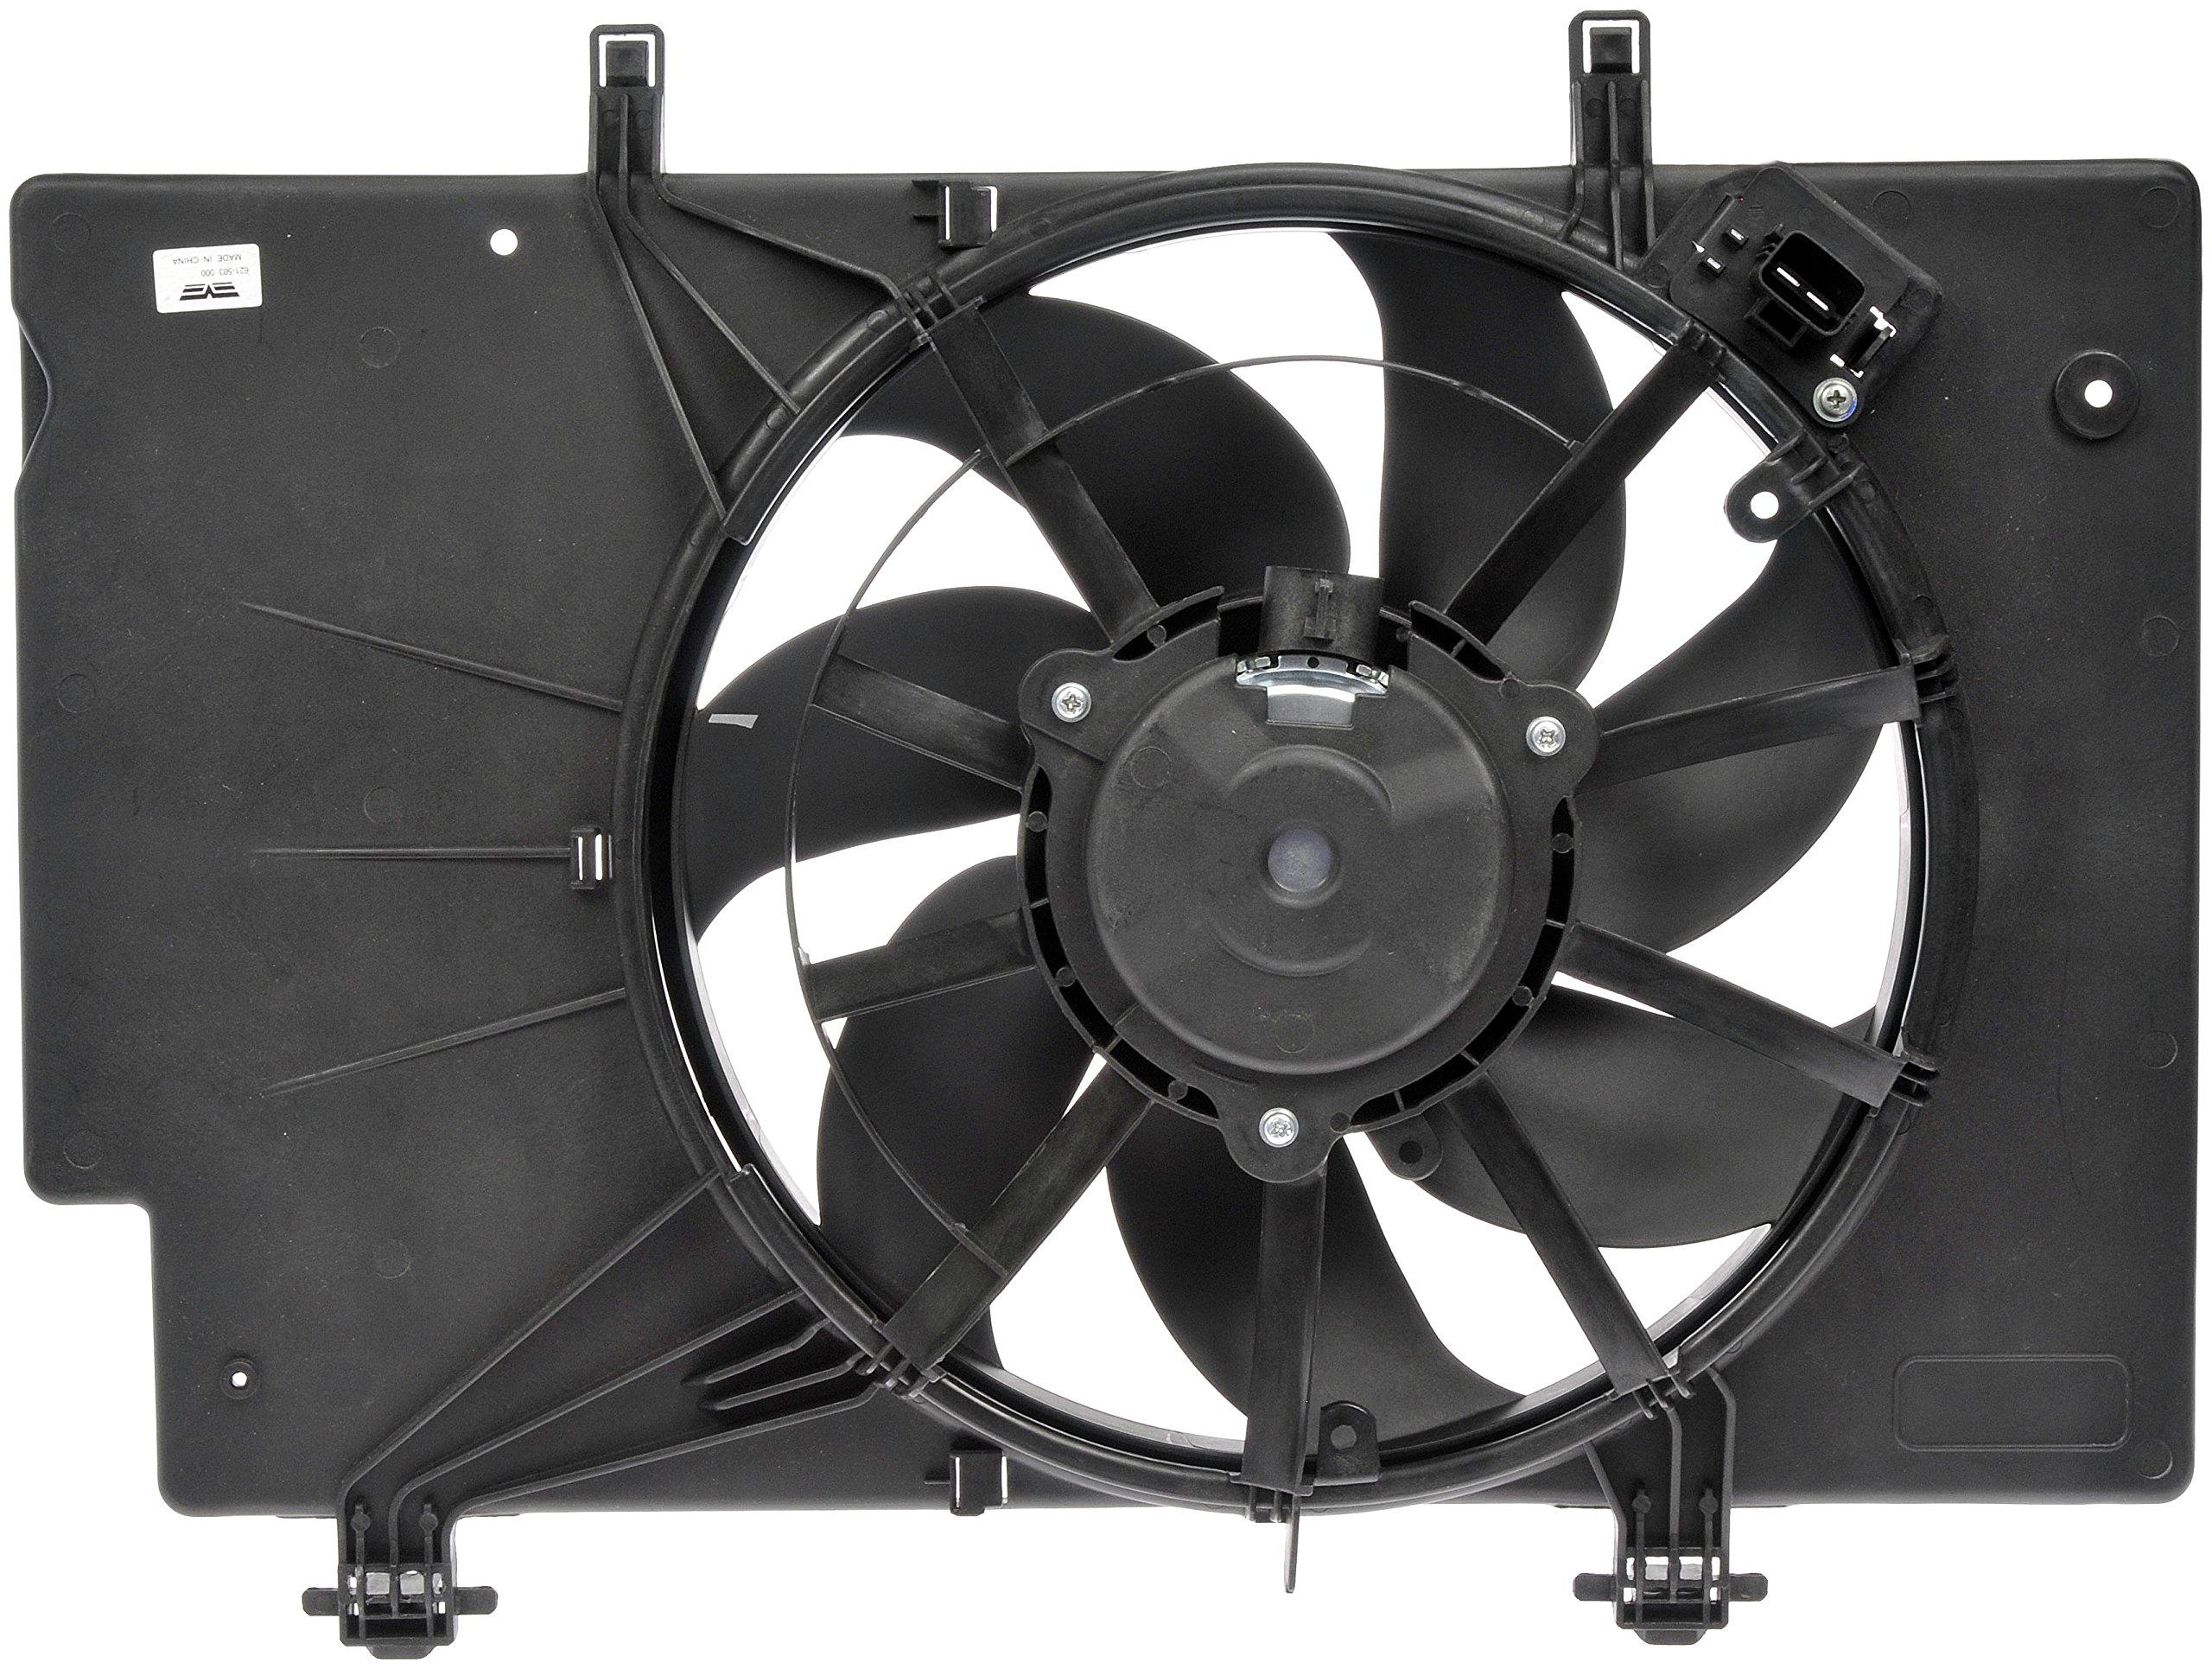 Dorman 621-503 Engine Cooling Fan Assembly